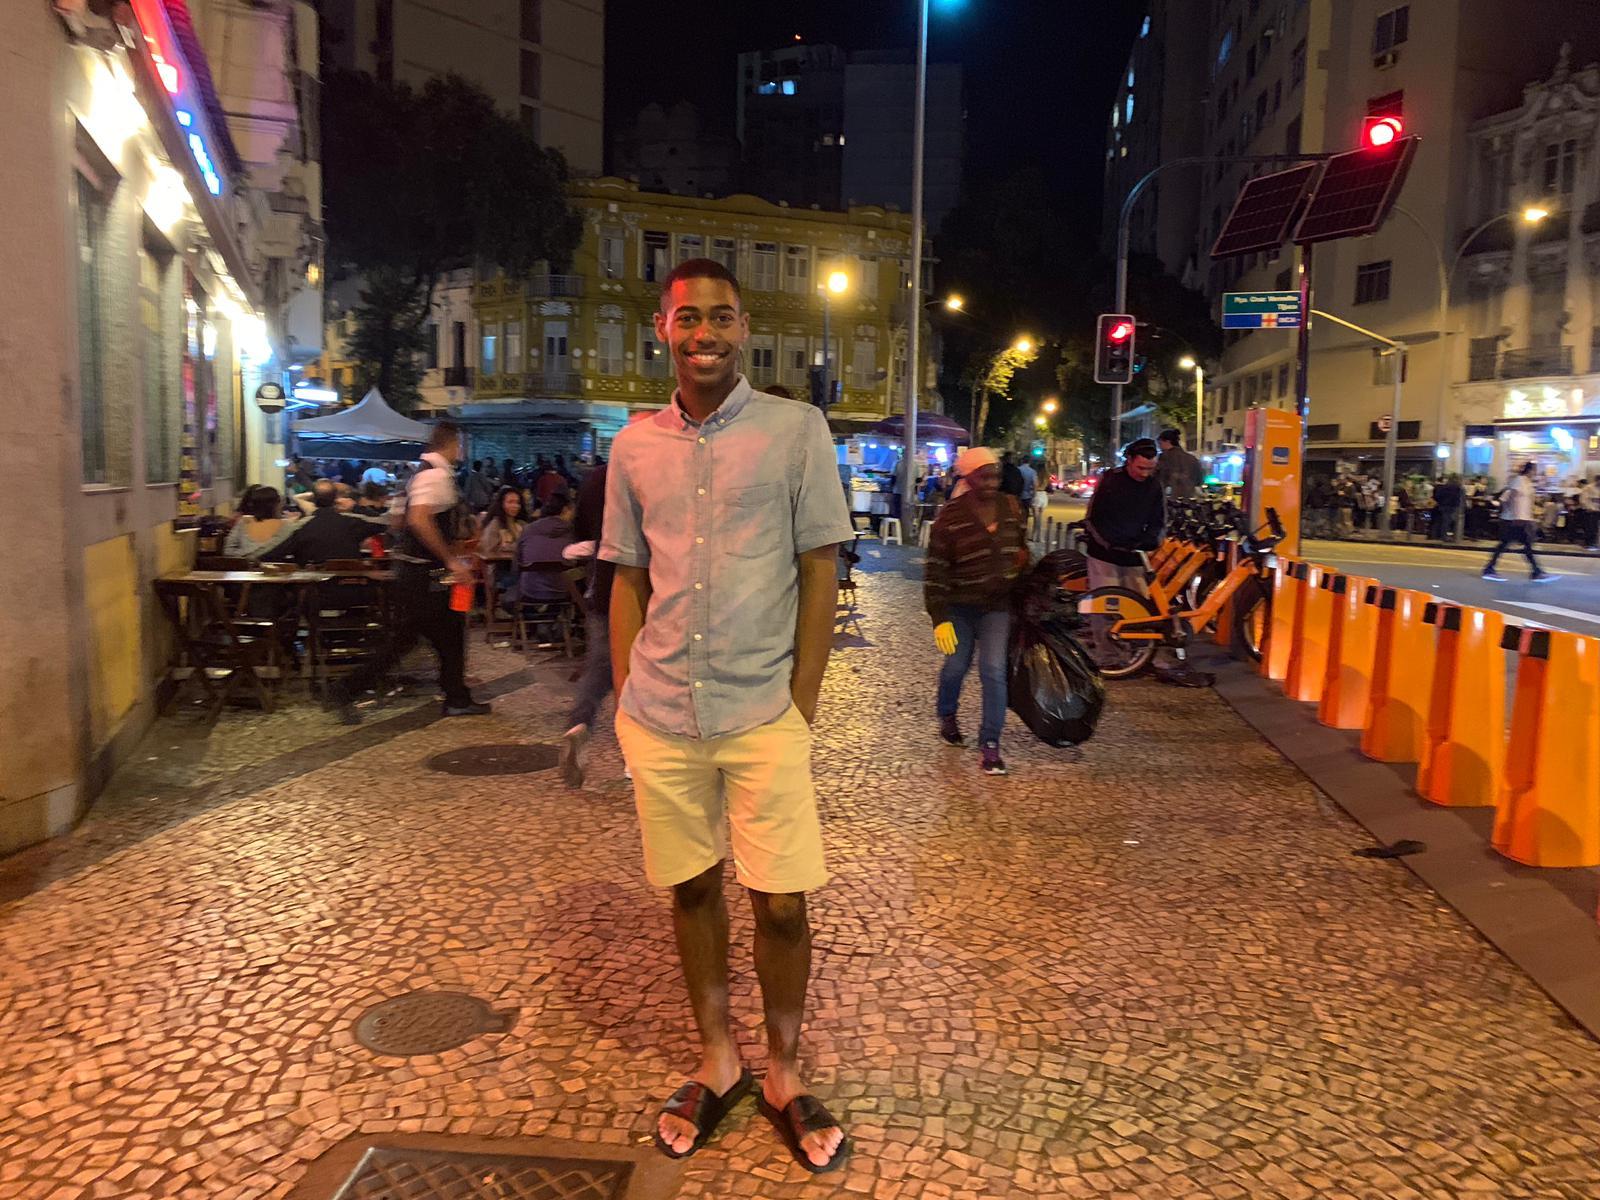 Rio & Learn's student Samuel posing in Lapa, Rio de Janeiro.